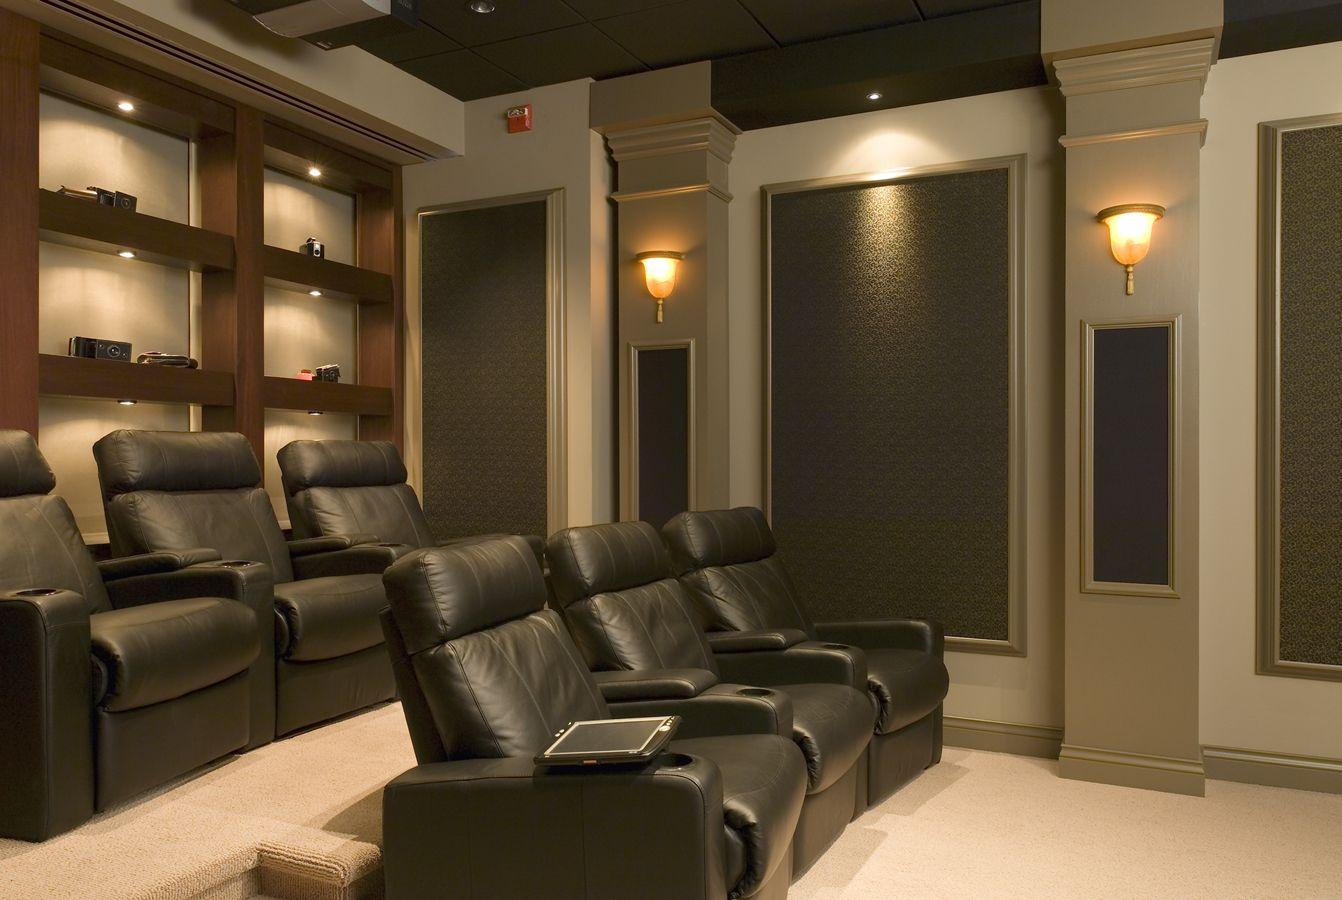 Extravagant design bedroom footboard tv lift according to